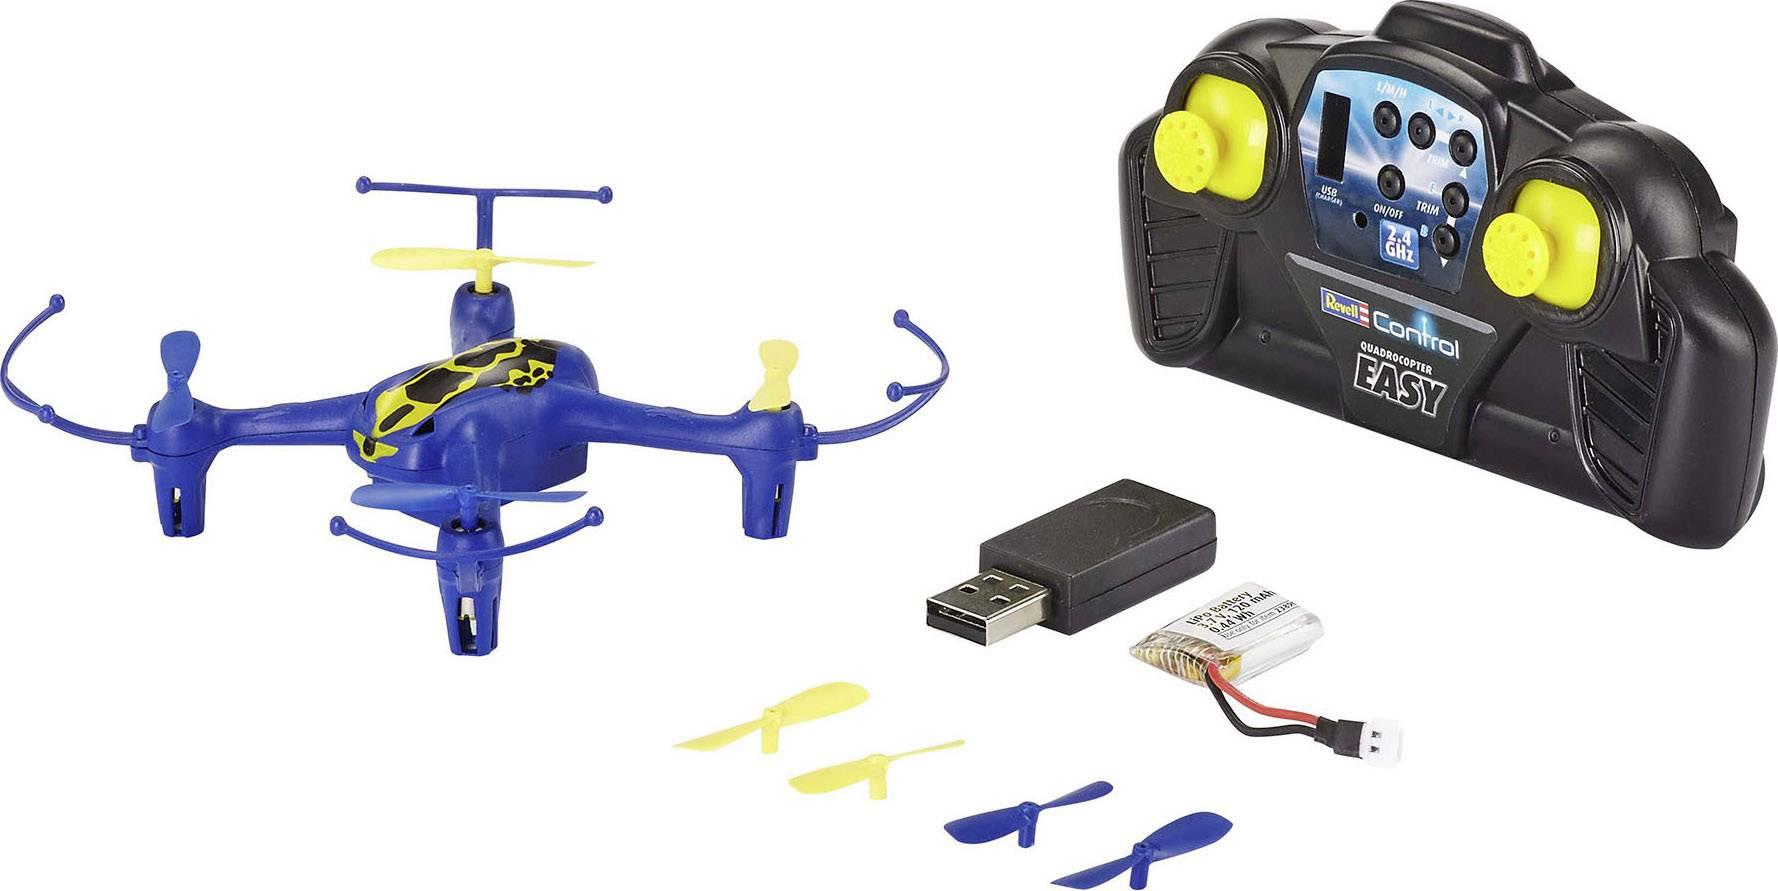 Dron Revell Control EASY, RtF